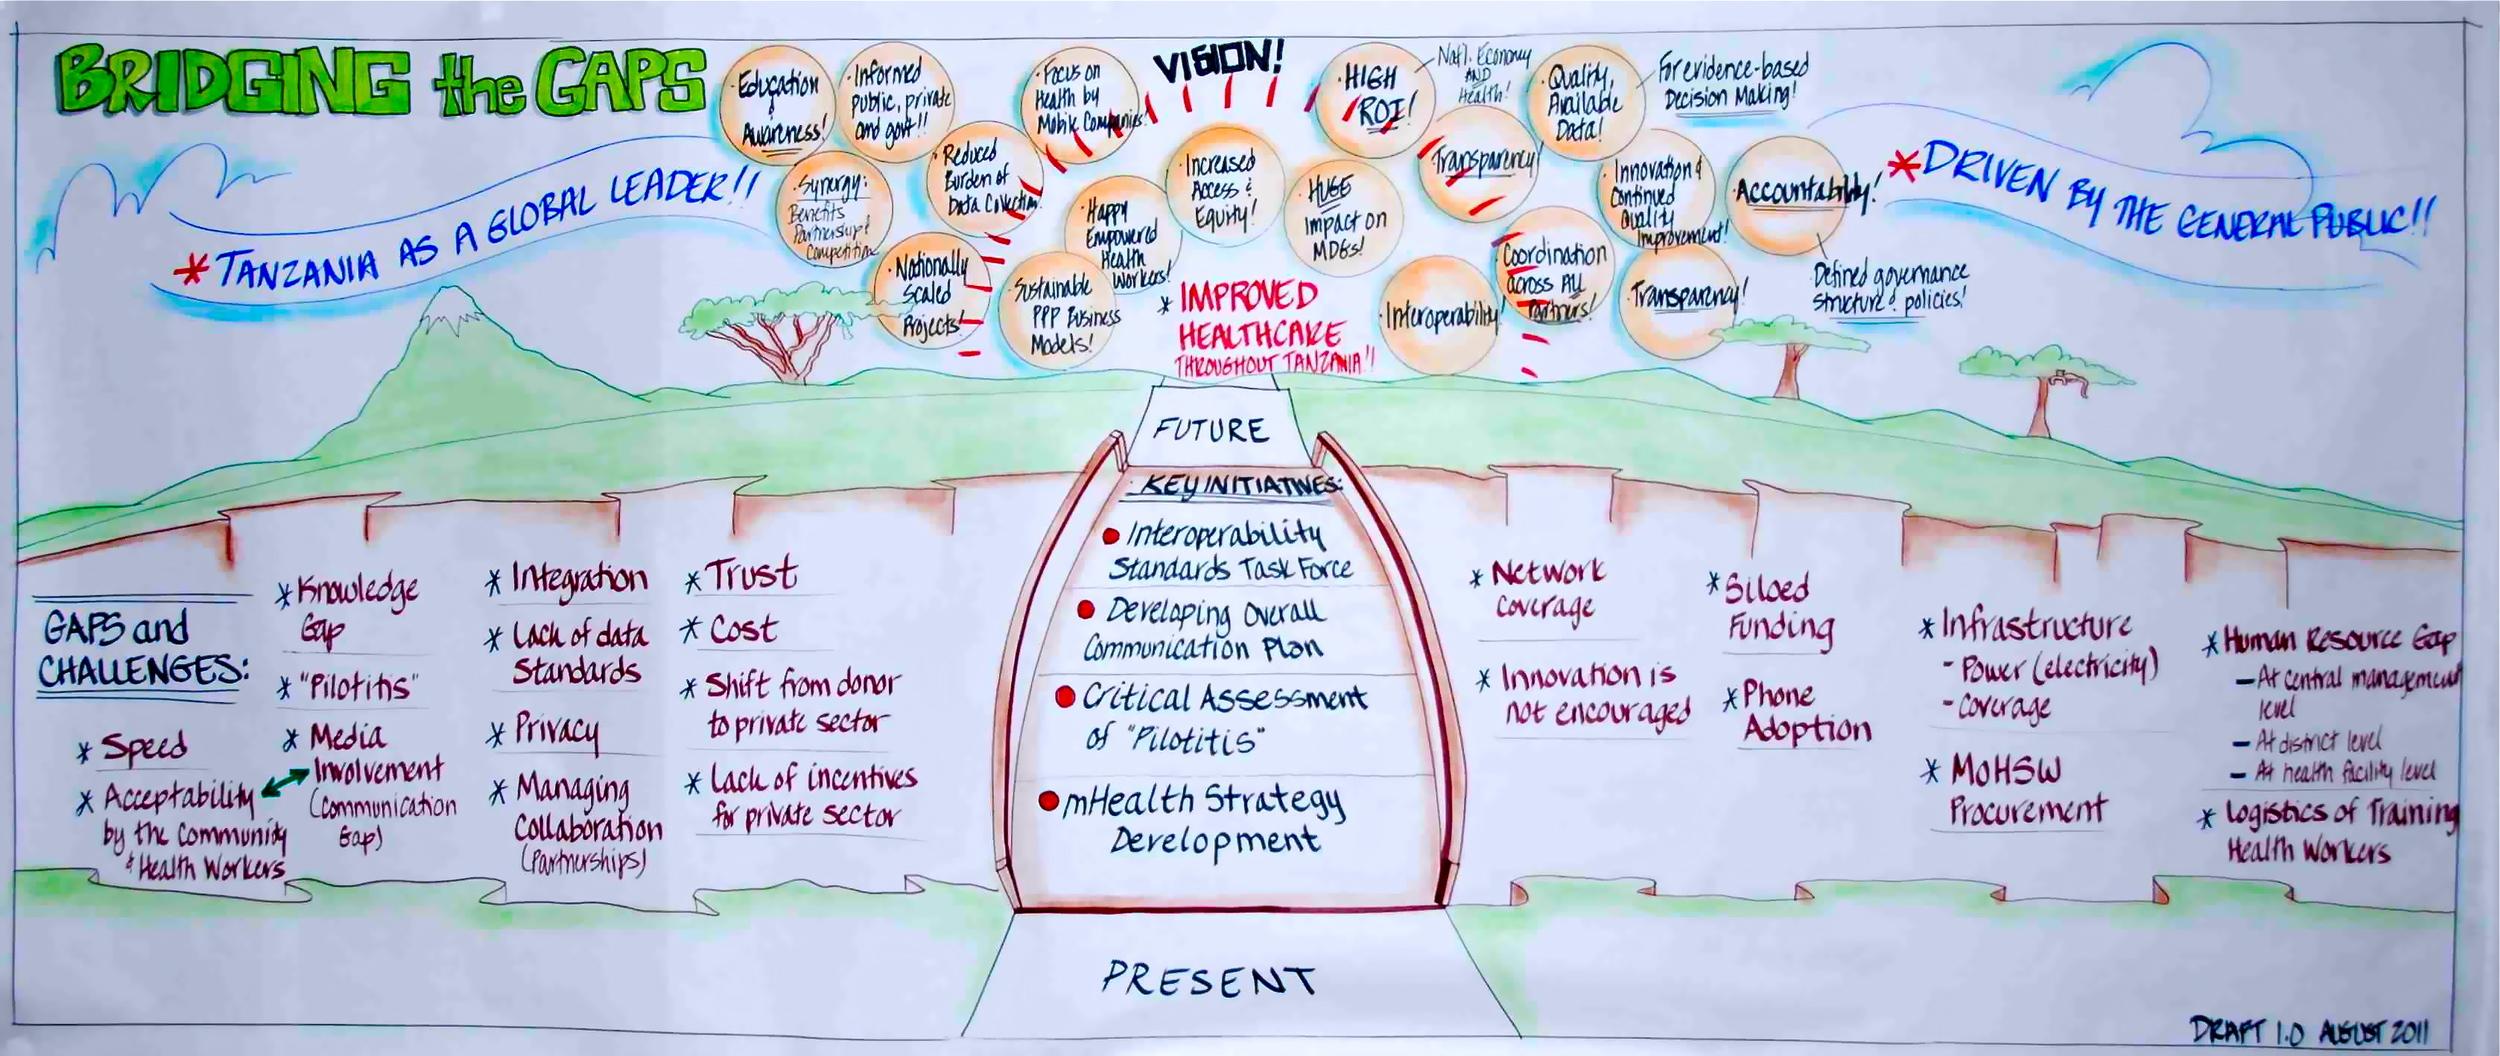 Tanzania+Ministry+of+Health+Final+Bridge+Mural+Vision.jpg